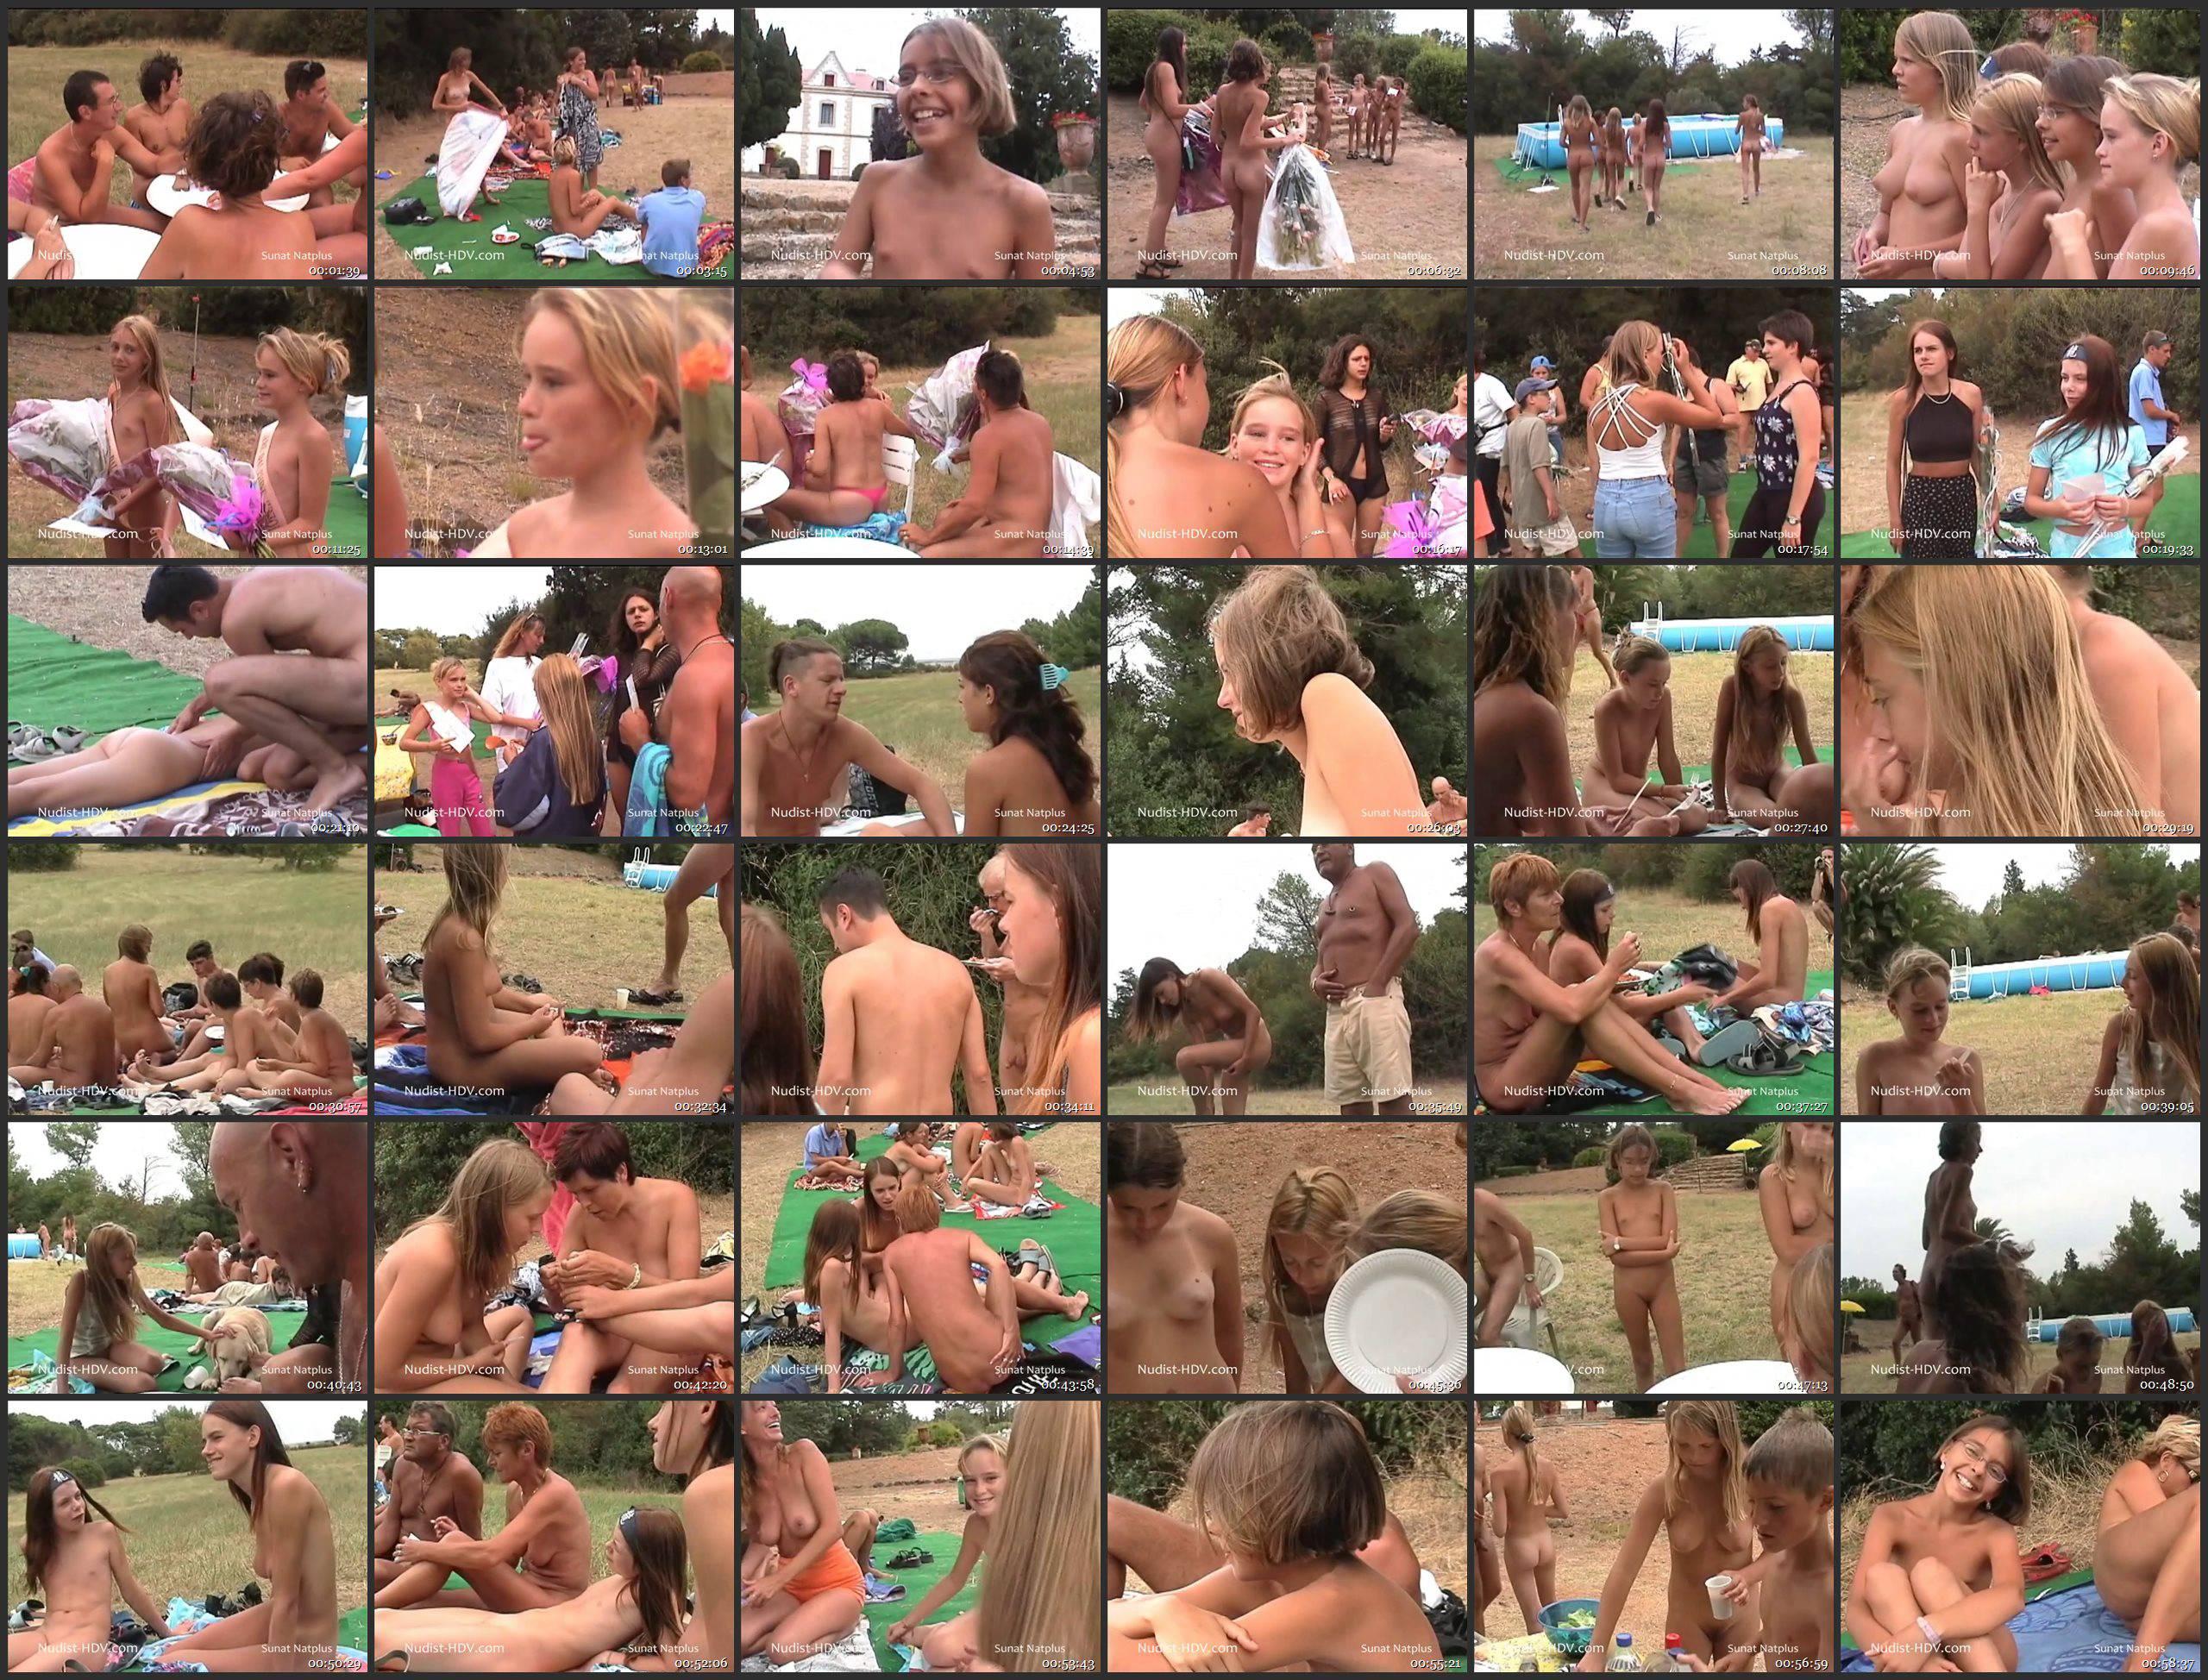 Nudist-HDV-Jr. Teen Beauty Pageant NC12-B - Thumbnails